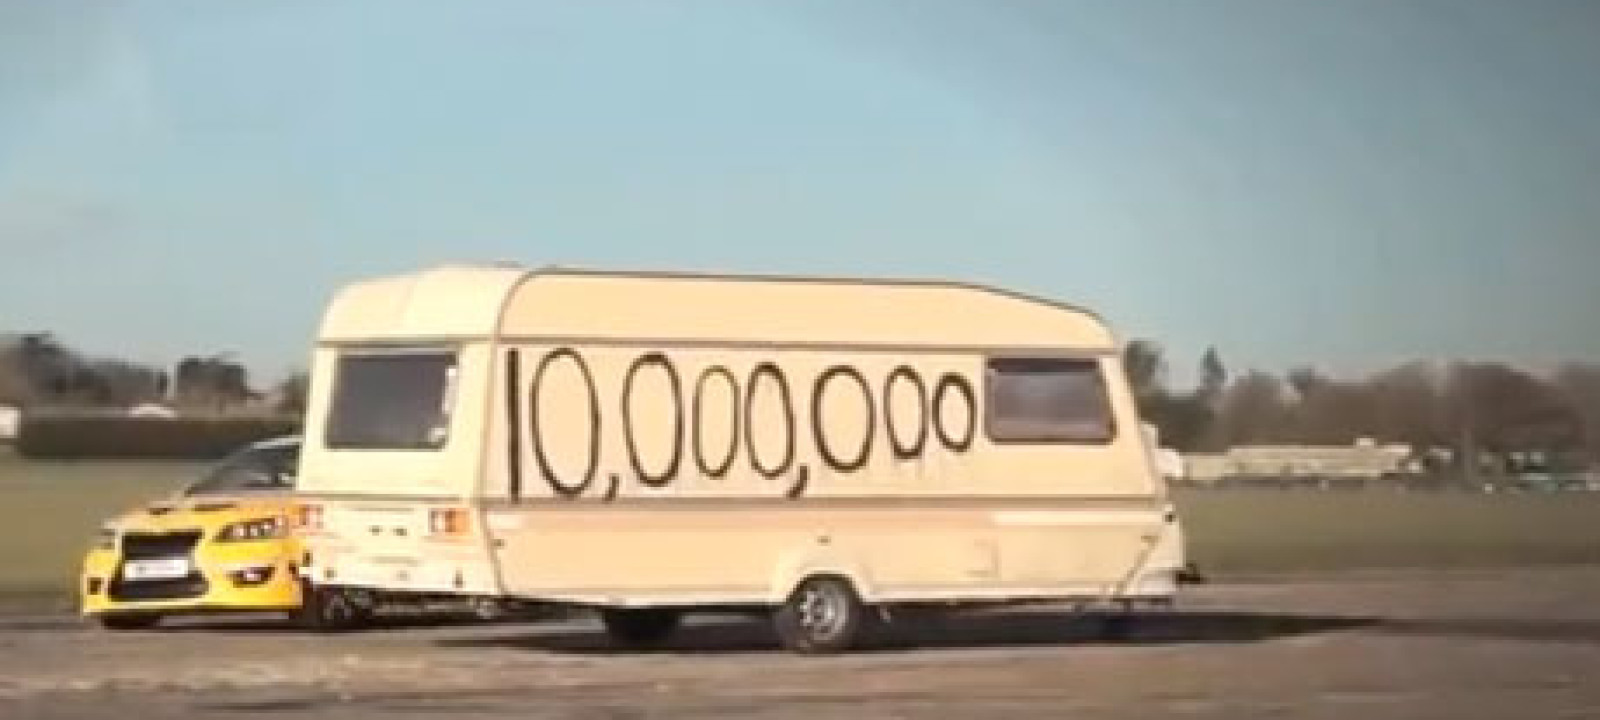 460x300_caravan_10m